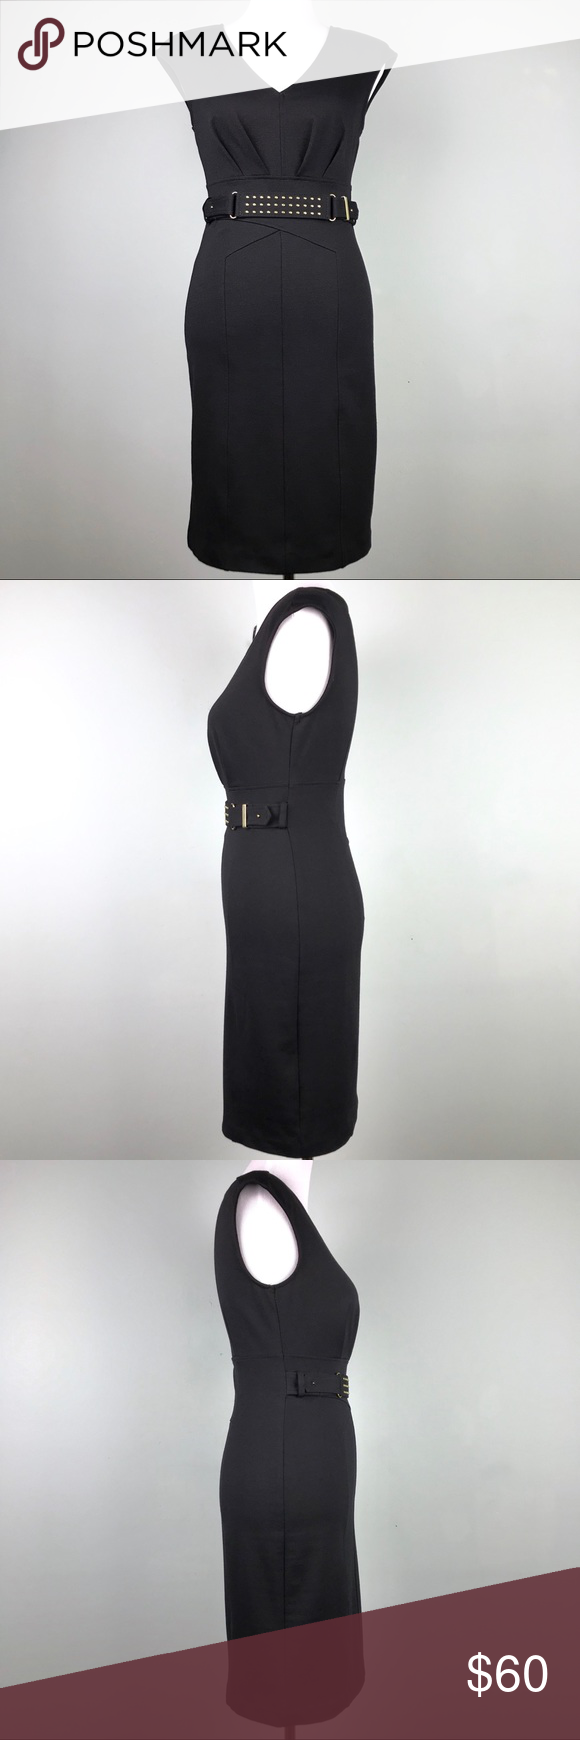 Jennifer Lopez Black Gold Sleeveless Dress Size 2 #blacksleevelessdress